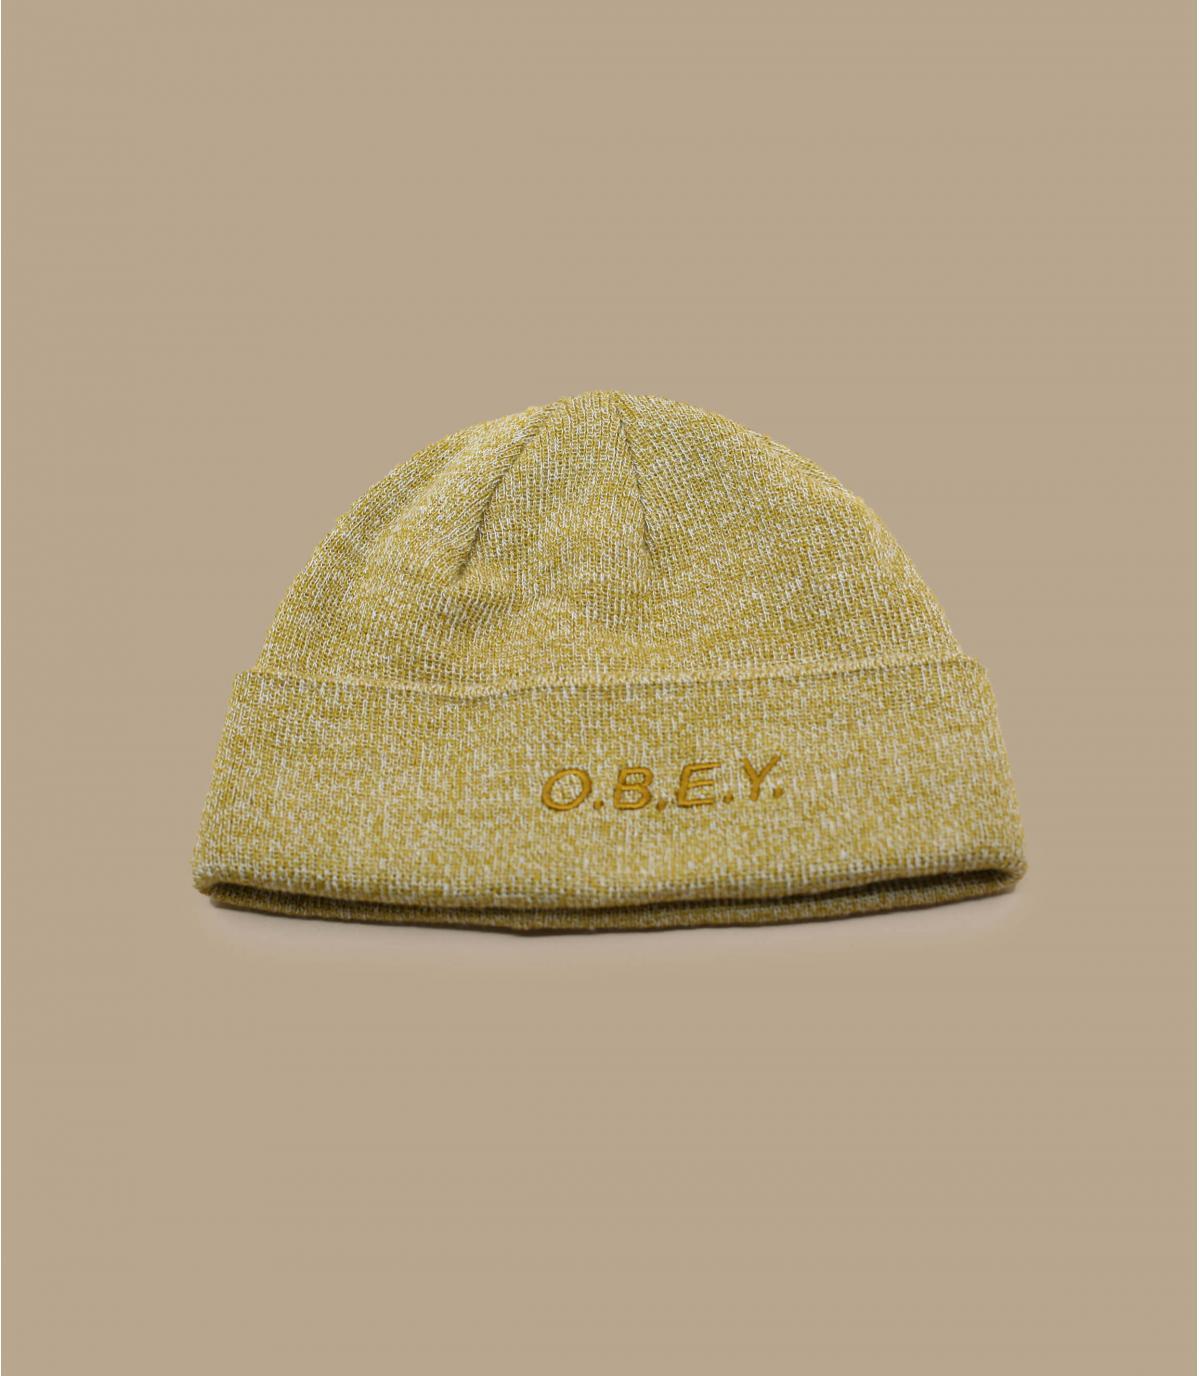 beige Obey beanie.